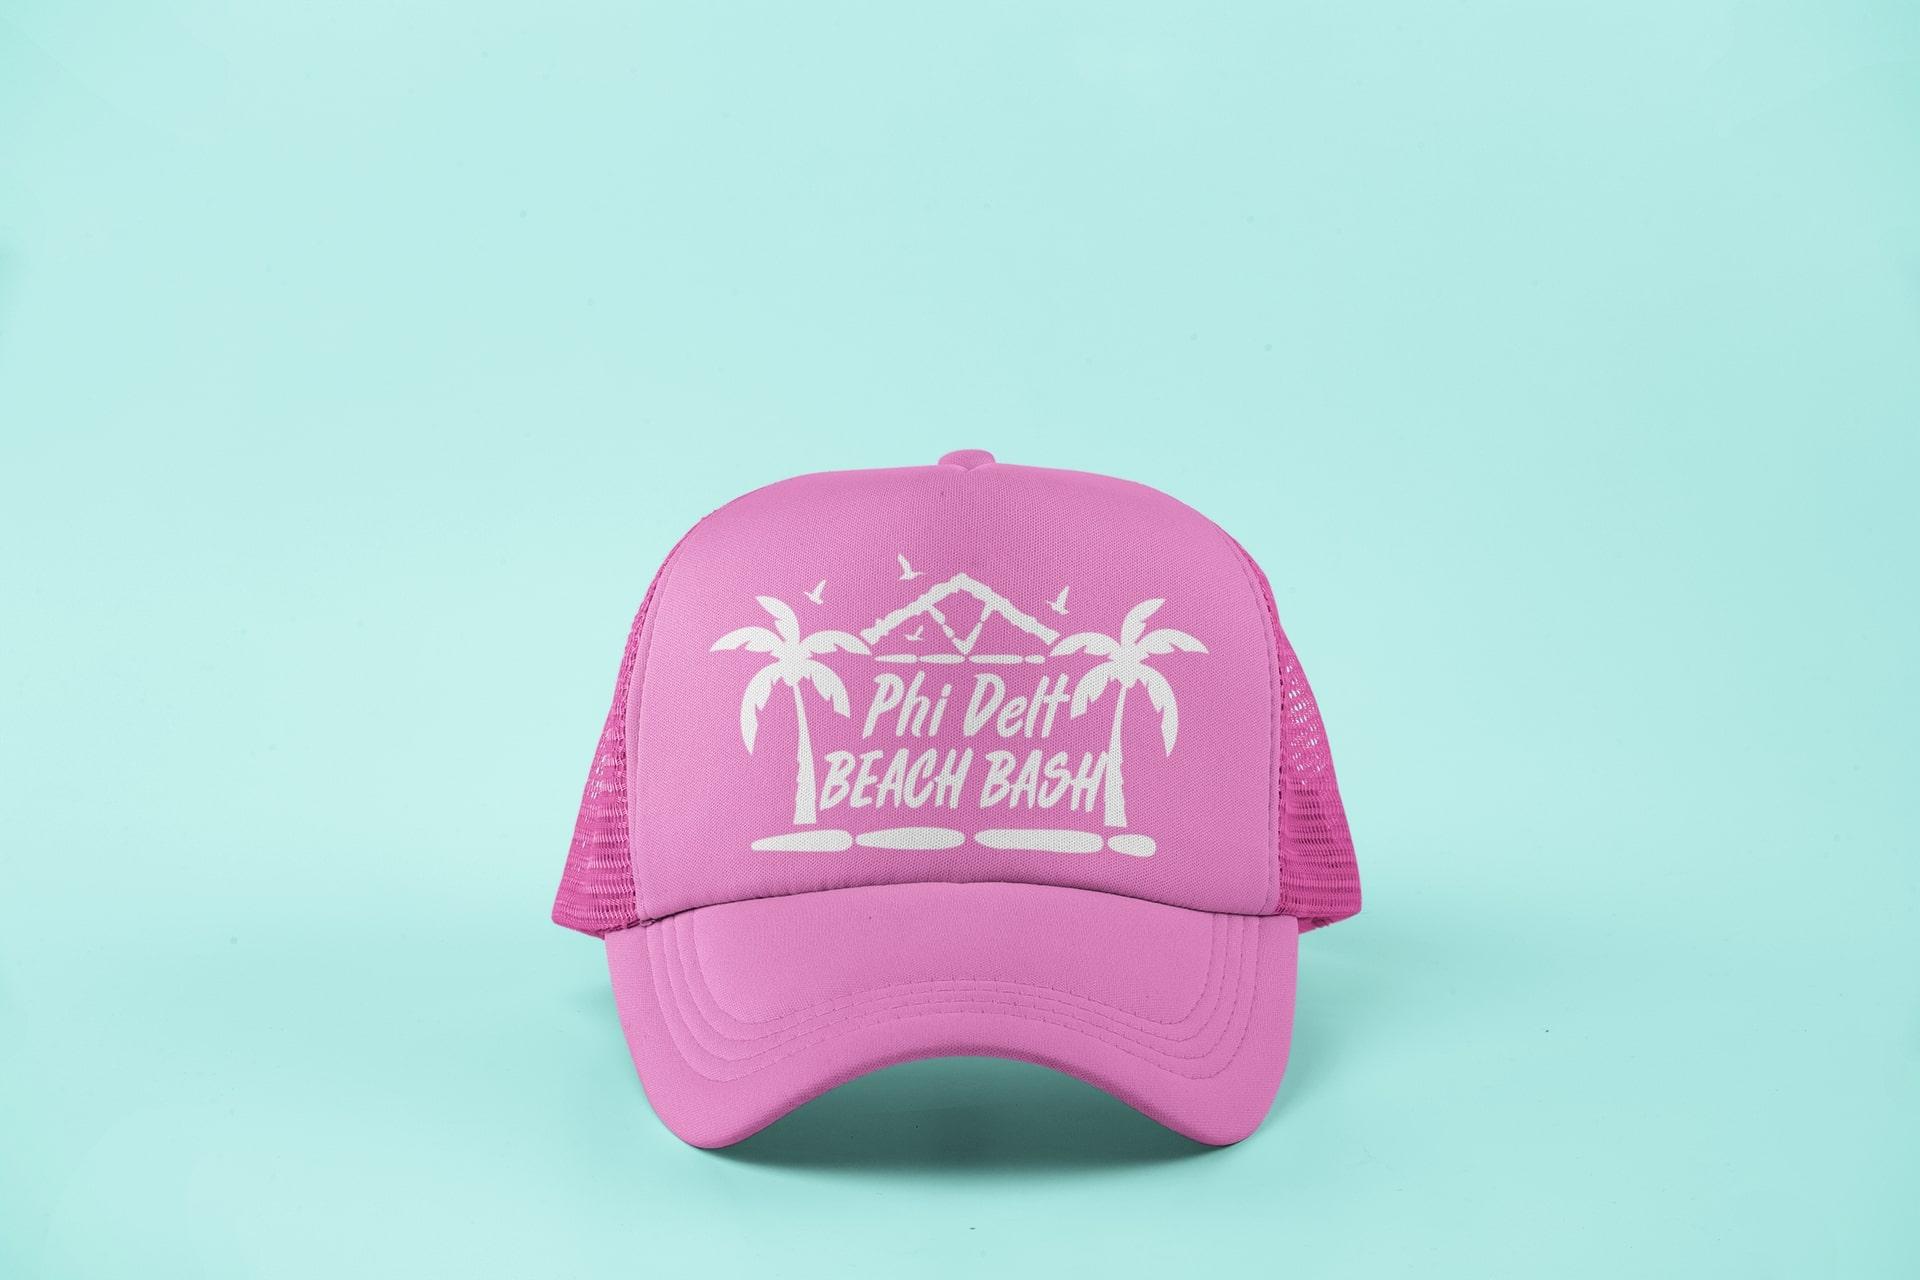 Phi delta theta Hat Beach Bash